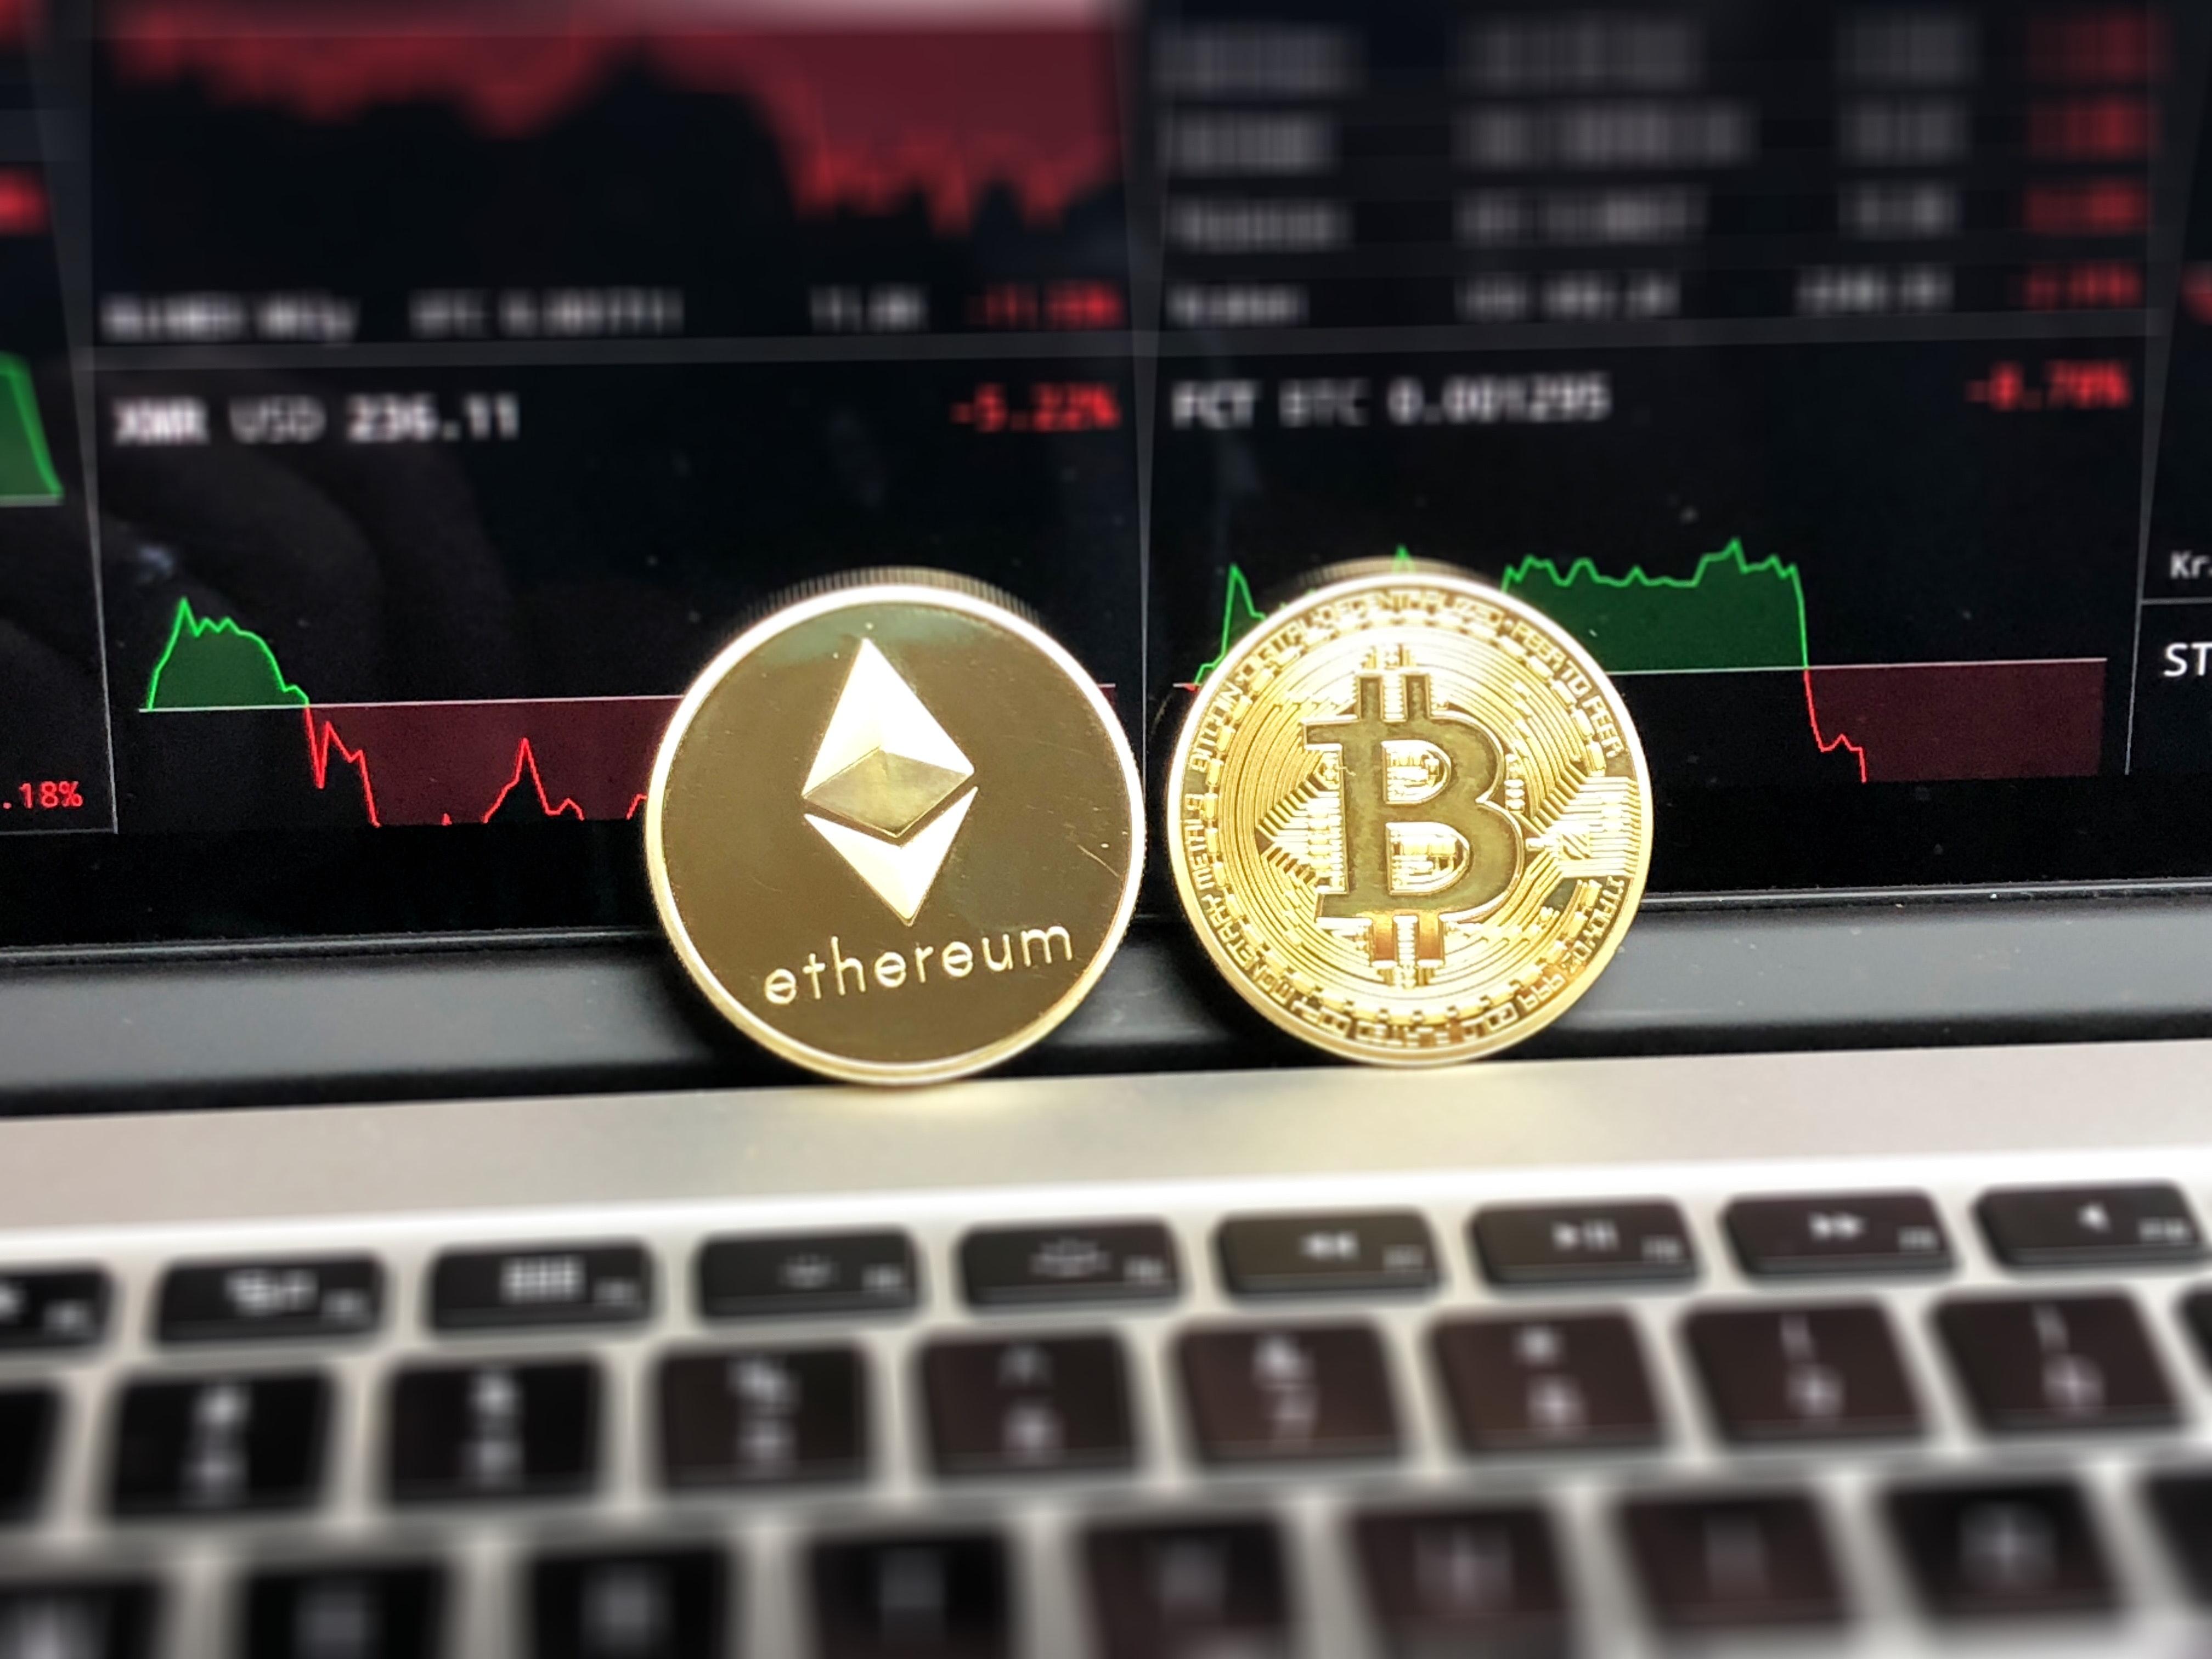 ic mercati deposito bitcoin